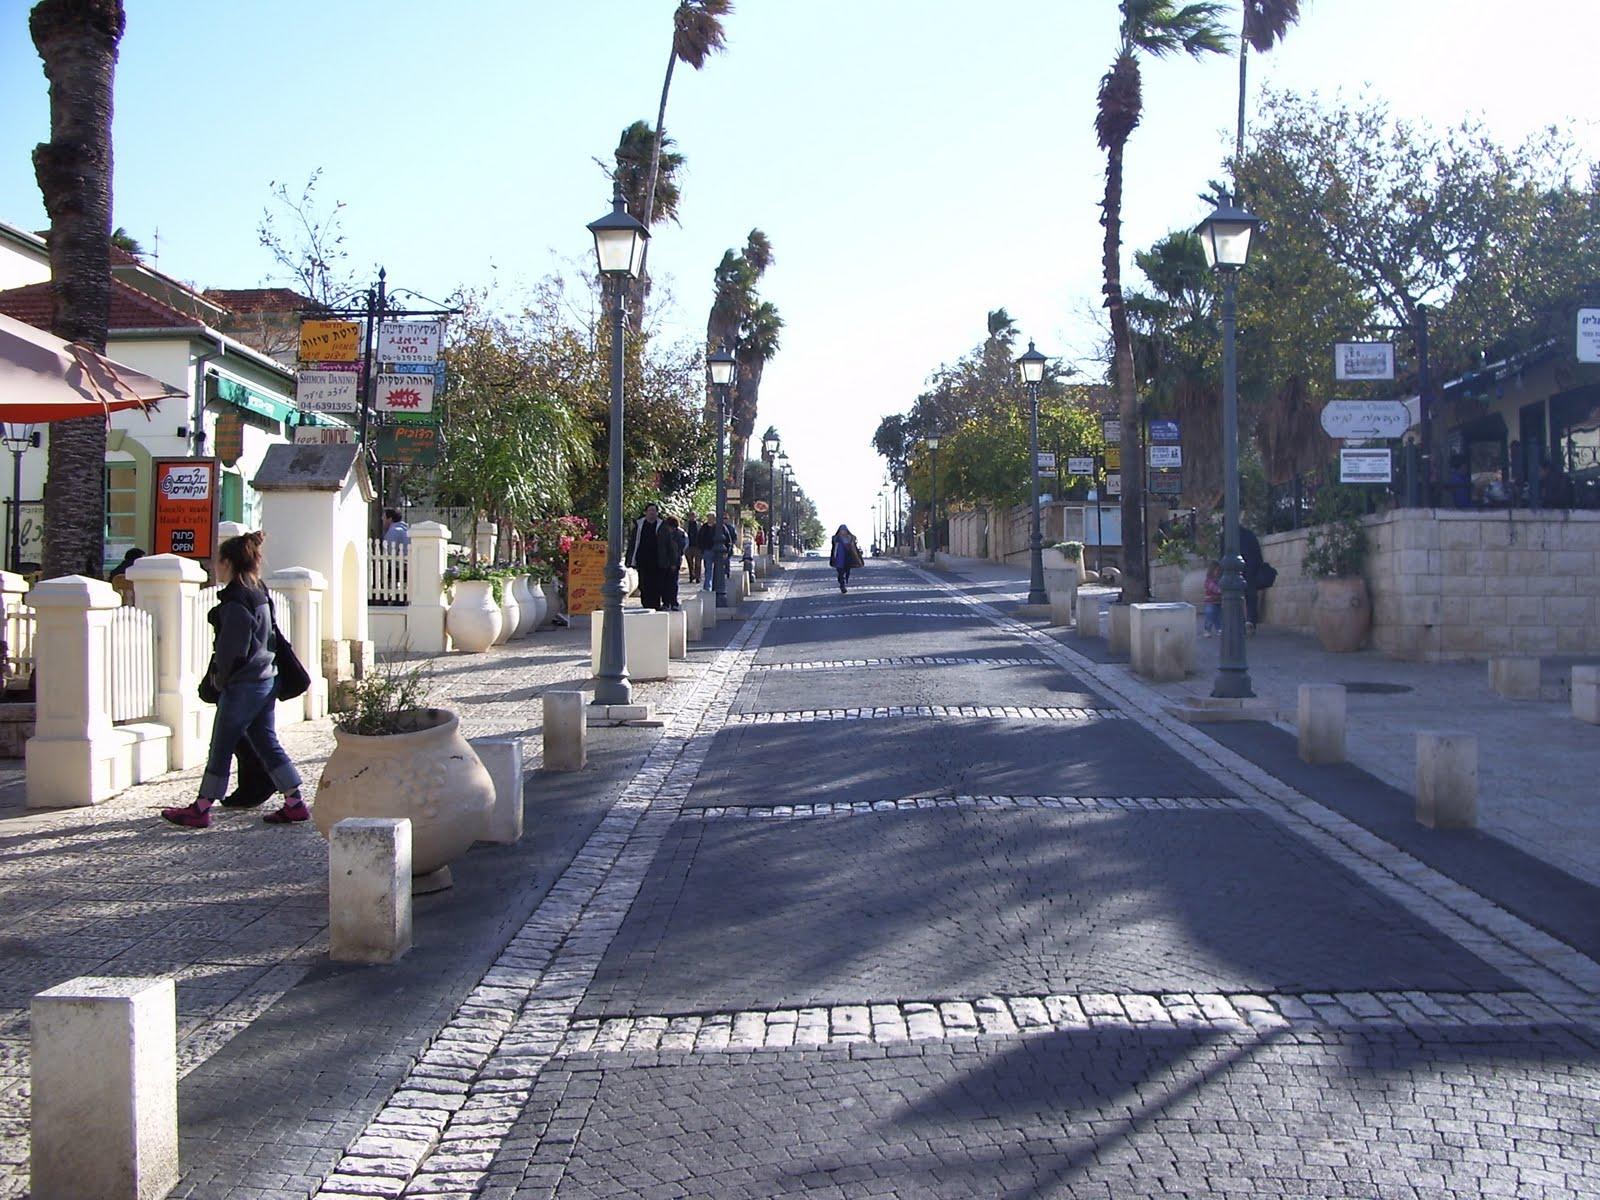 Mazkeret Batya Israel  city images : Zikhron Yaacov Mazkeret Batya Turismo Israel